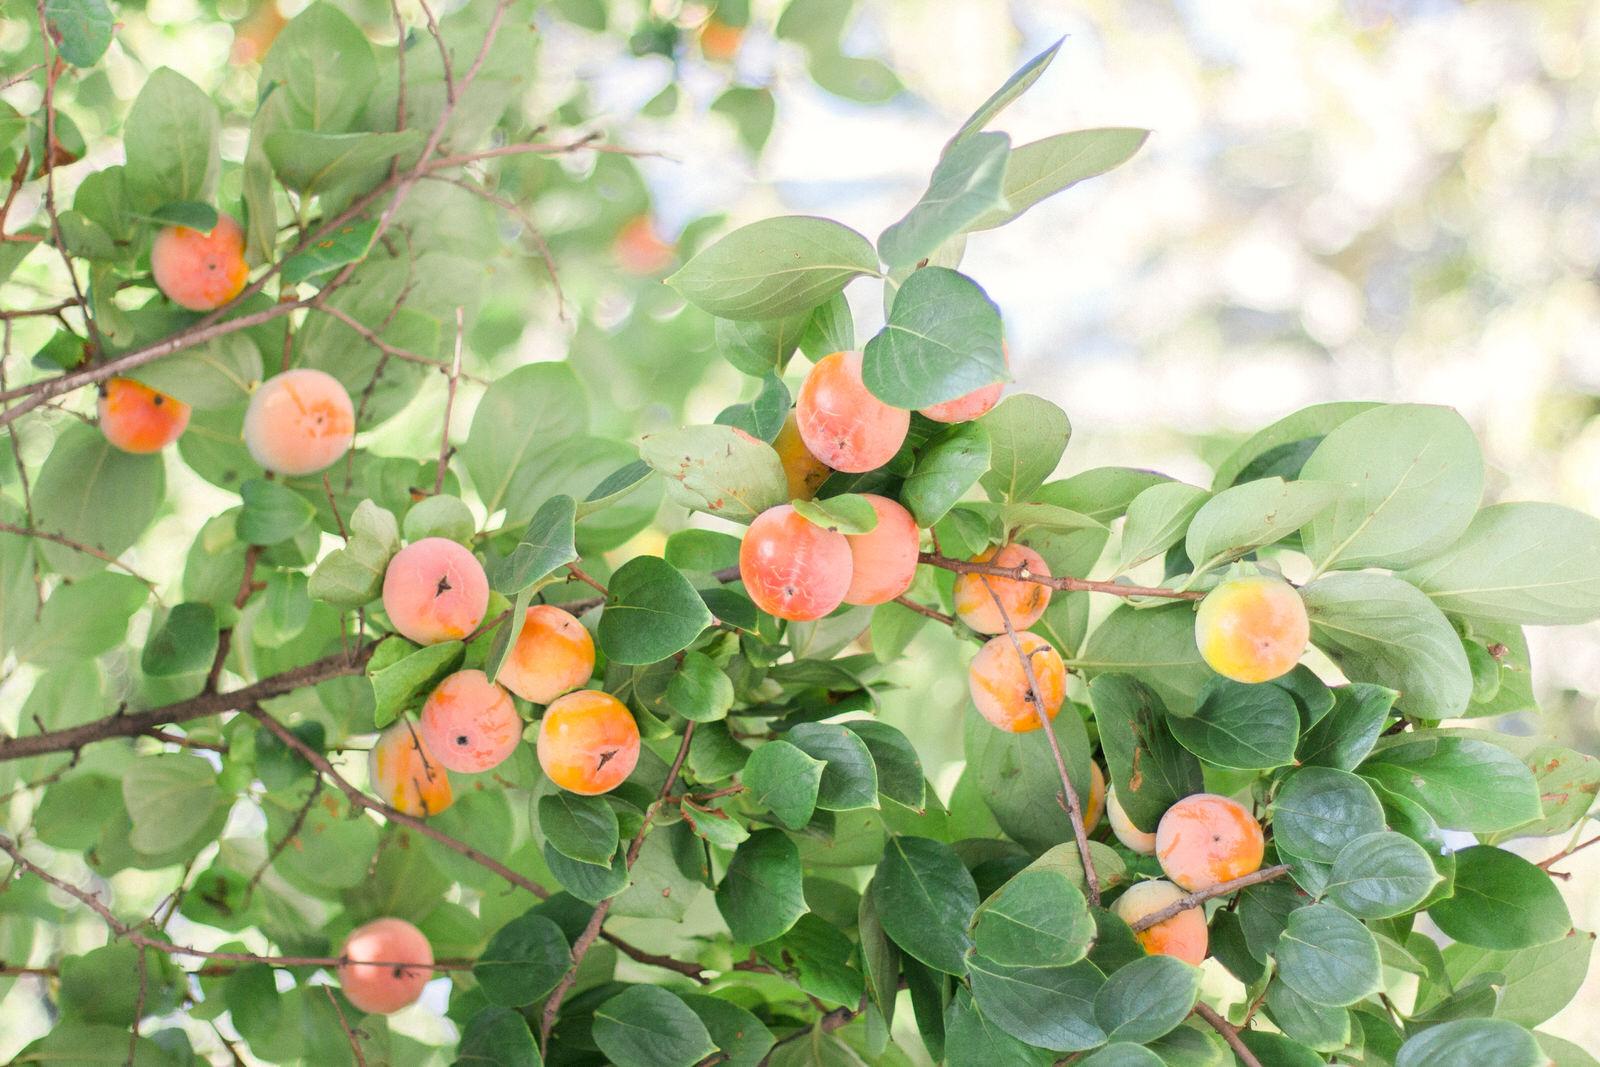 Peaches-Rome-Travel-photography.jpg